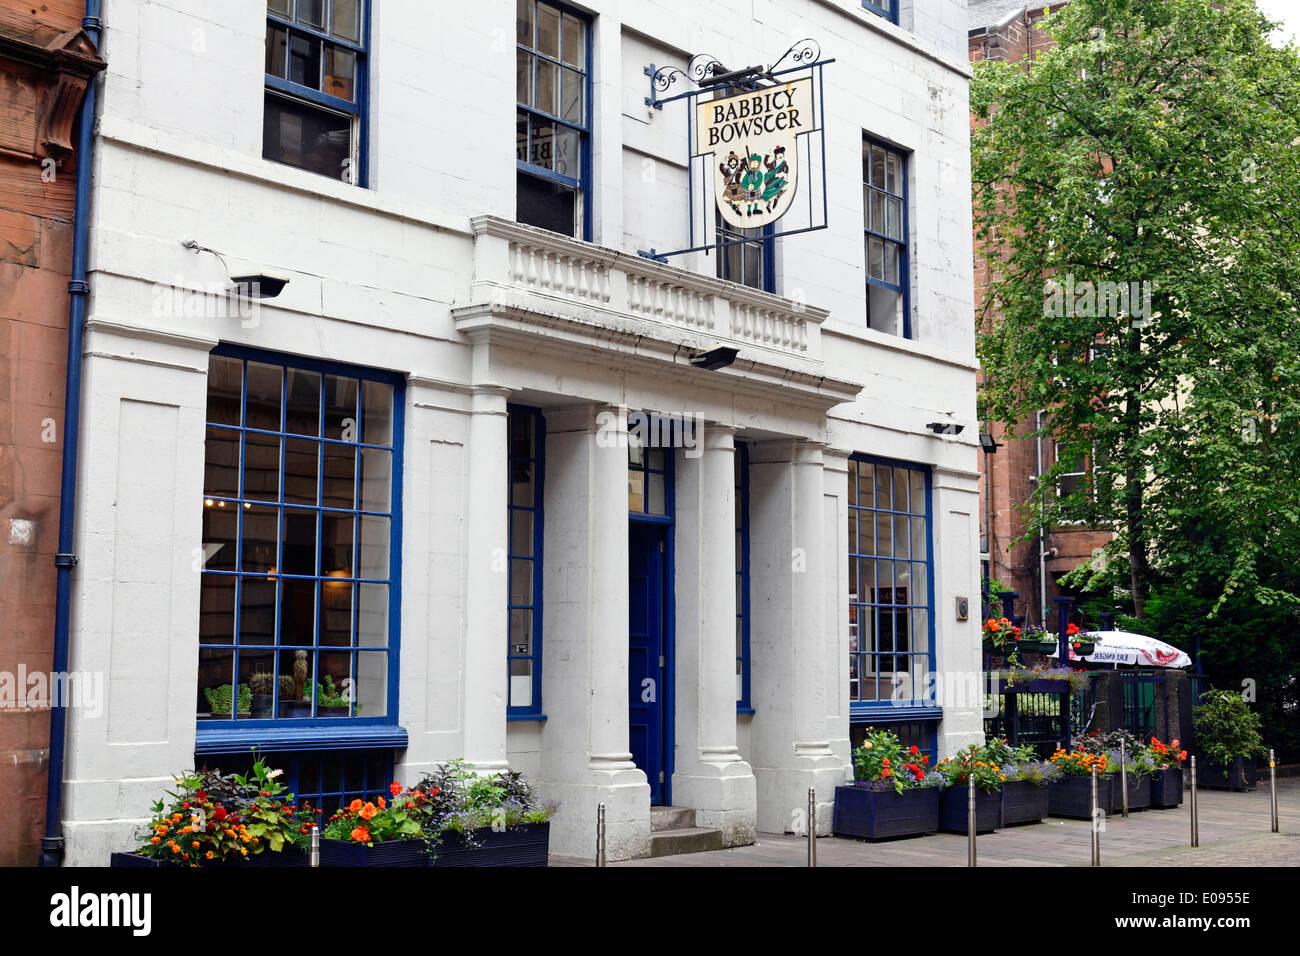 Babbity Bowster pub on Blackfriars Street in Glasgow's Merchant City, Scotland, UK Stock Photo